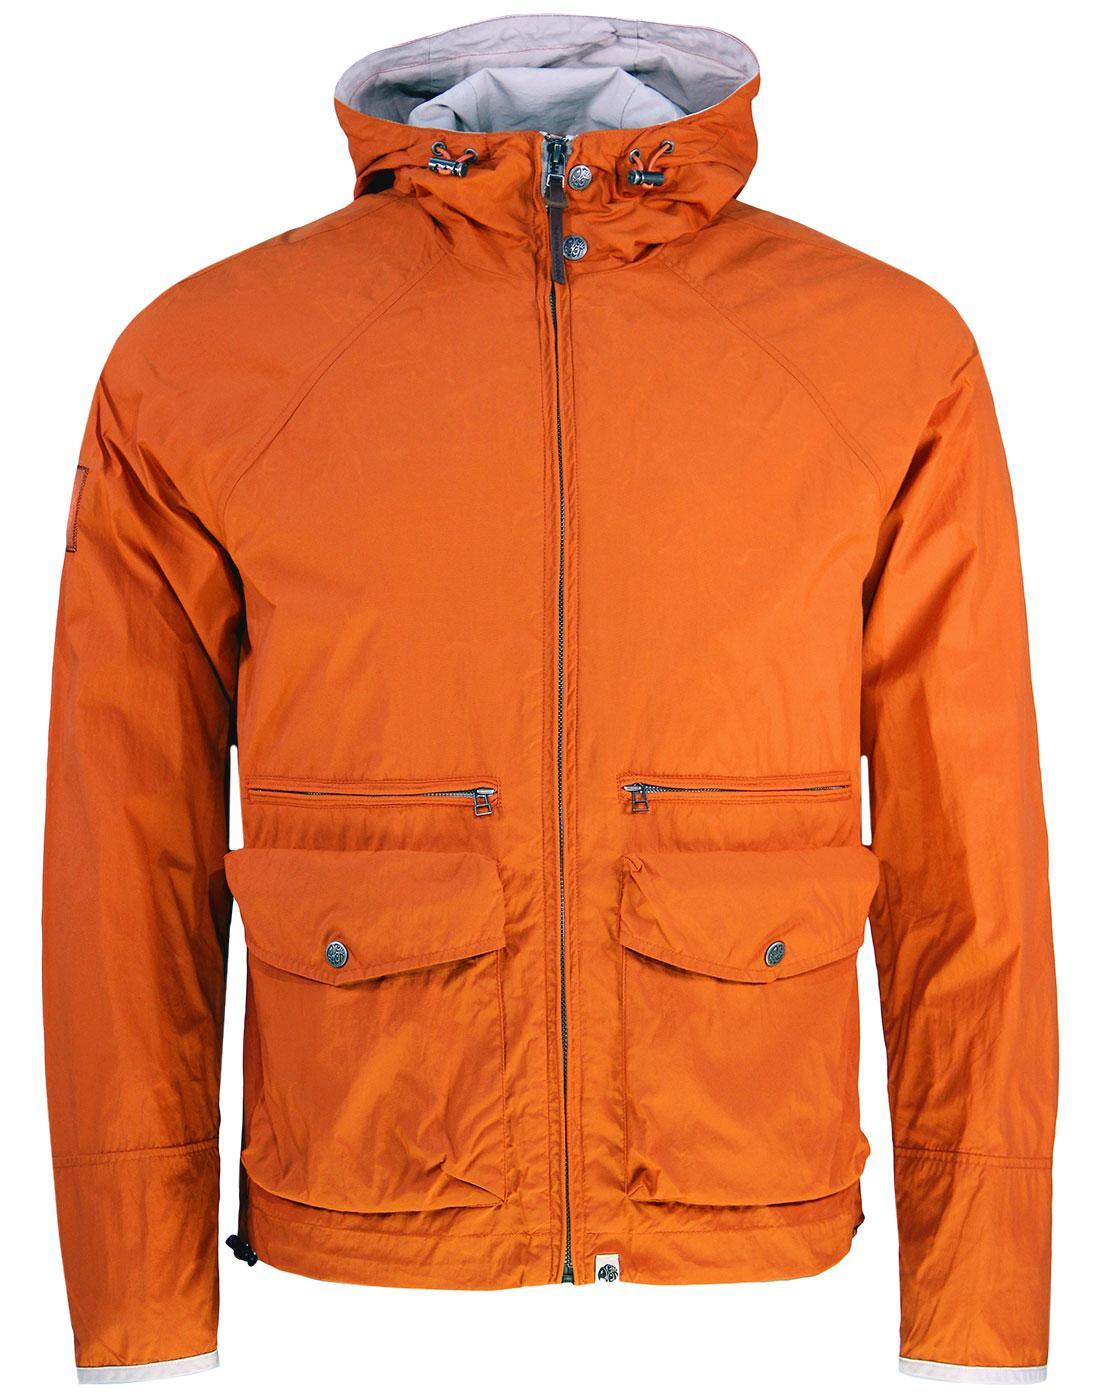 Huntley PRETTY GREEN Retro Orange Hooded Jacket